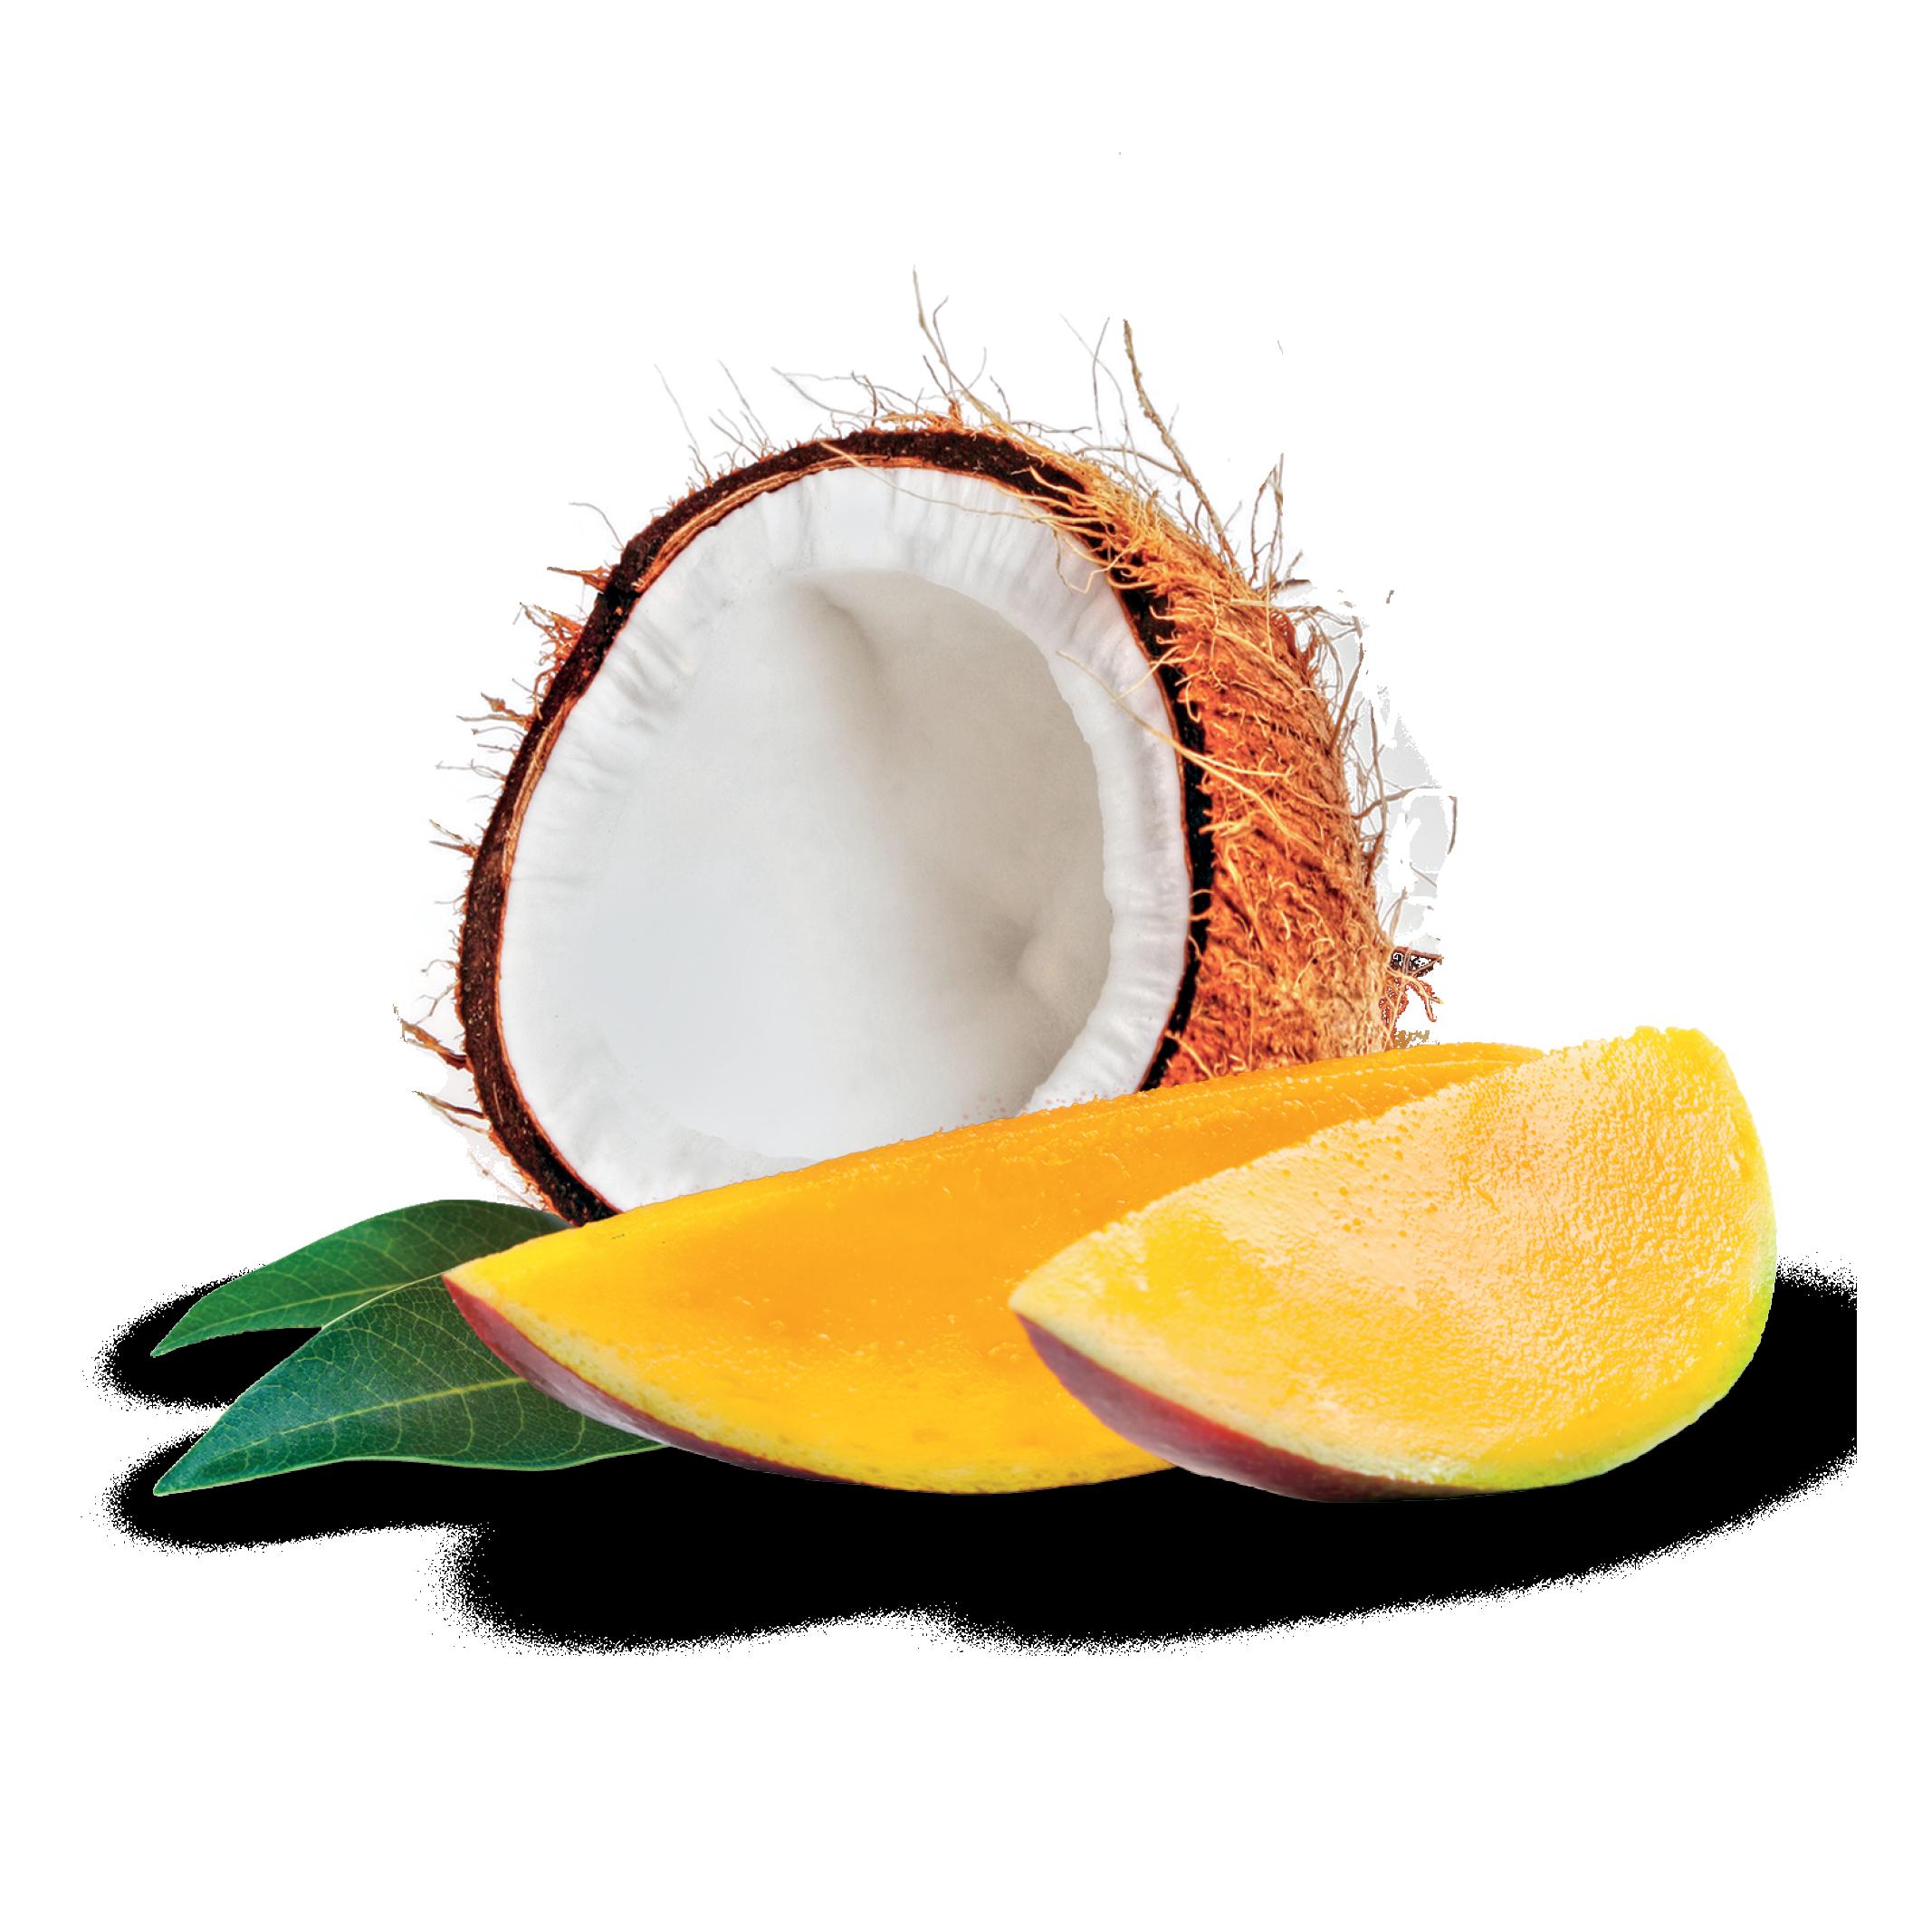 Coconut Mango: Yogurtland: Find Your Flavor